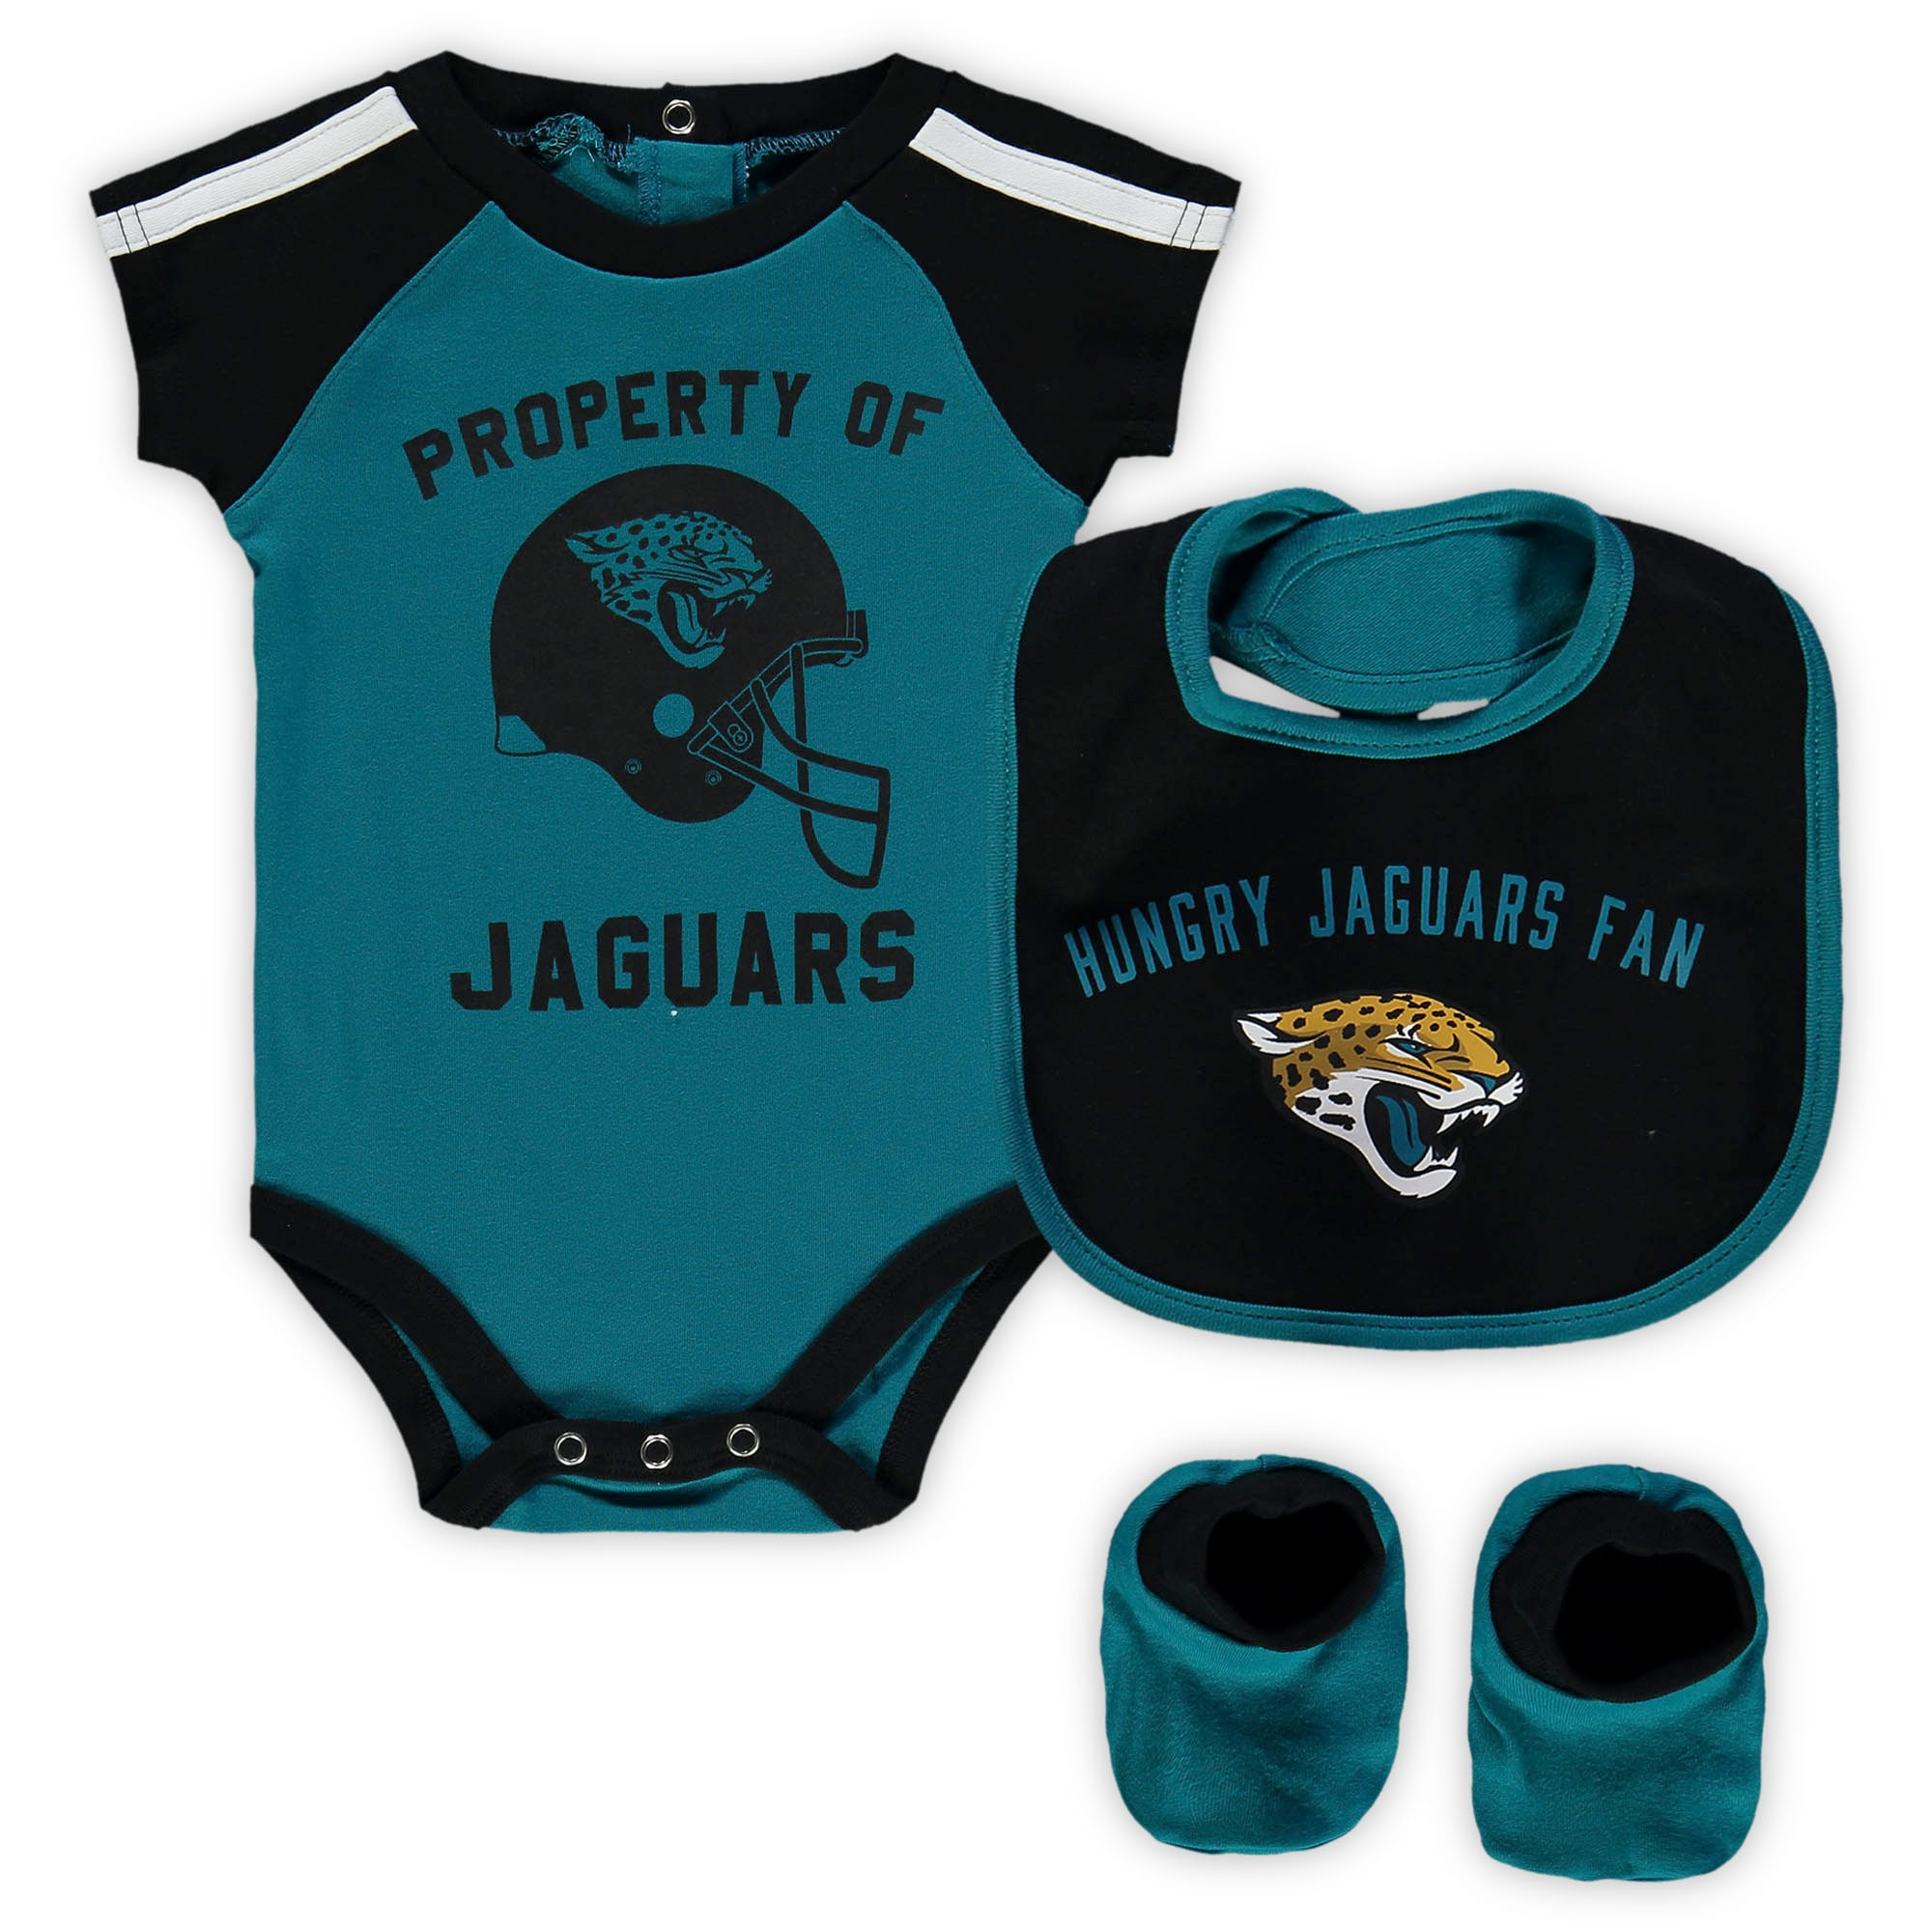 Jacksonville Jaguars Newborn & Infant Tackle Bodysuit, Bib & Booties Set - Teal/Black